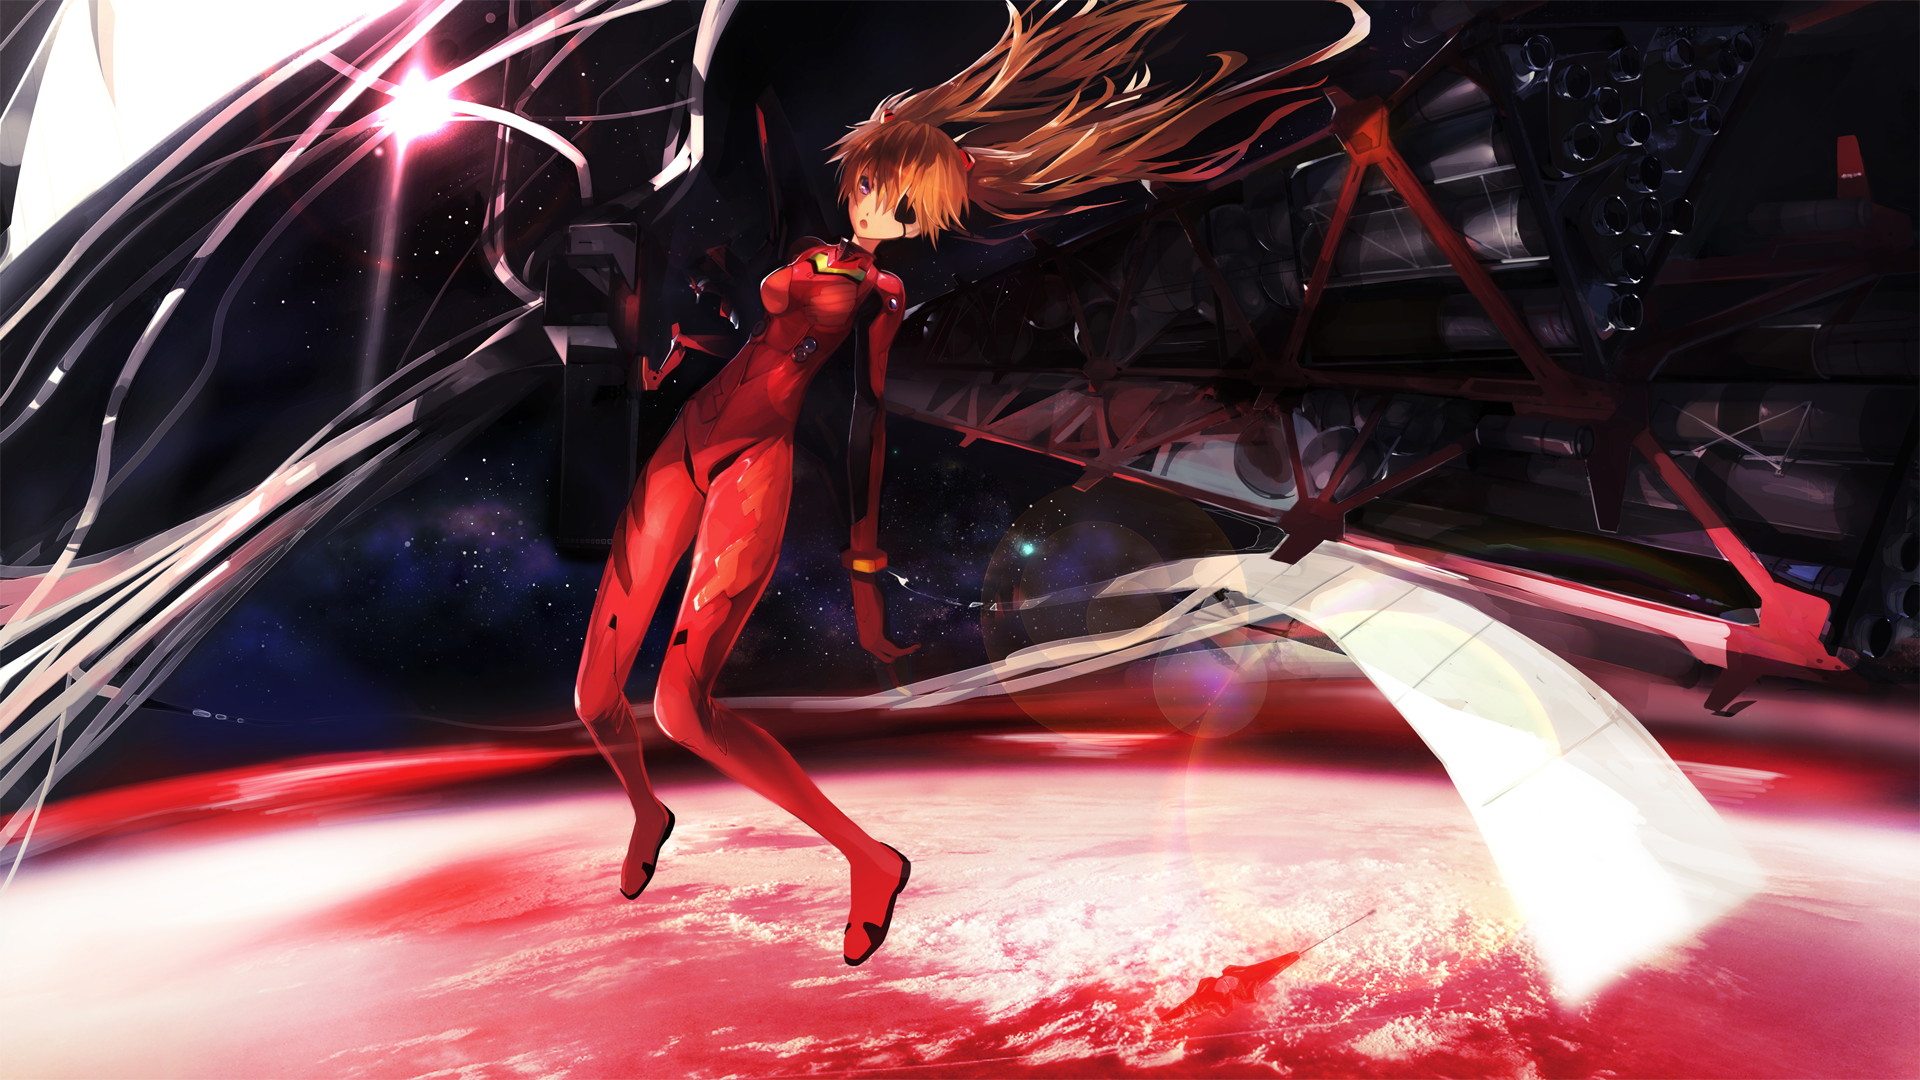 Anime 1920x1080 anime Neon Genesis Evangelion Asuka Langley Soryu